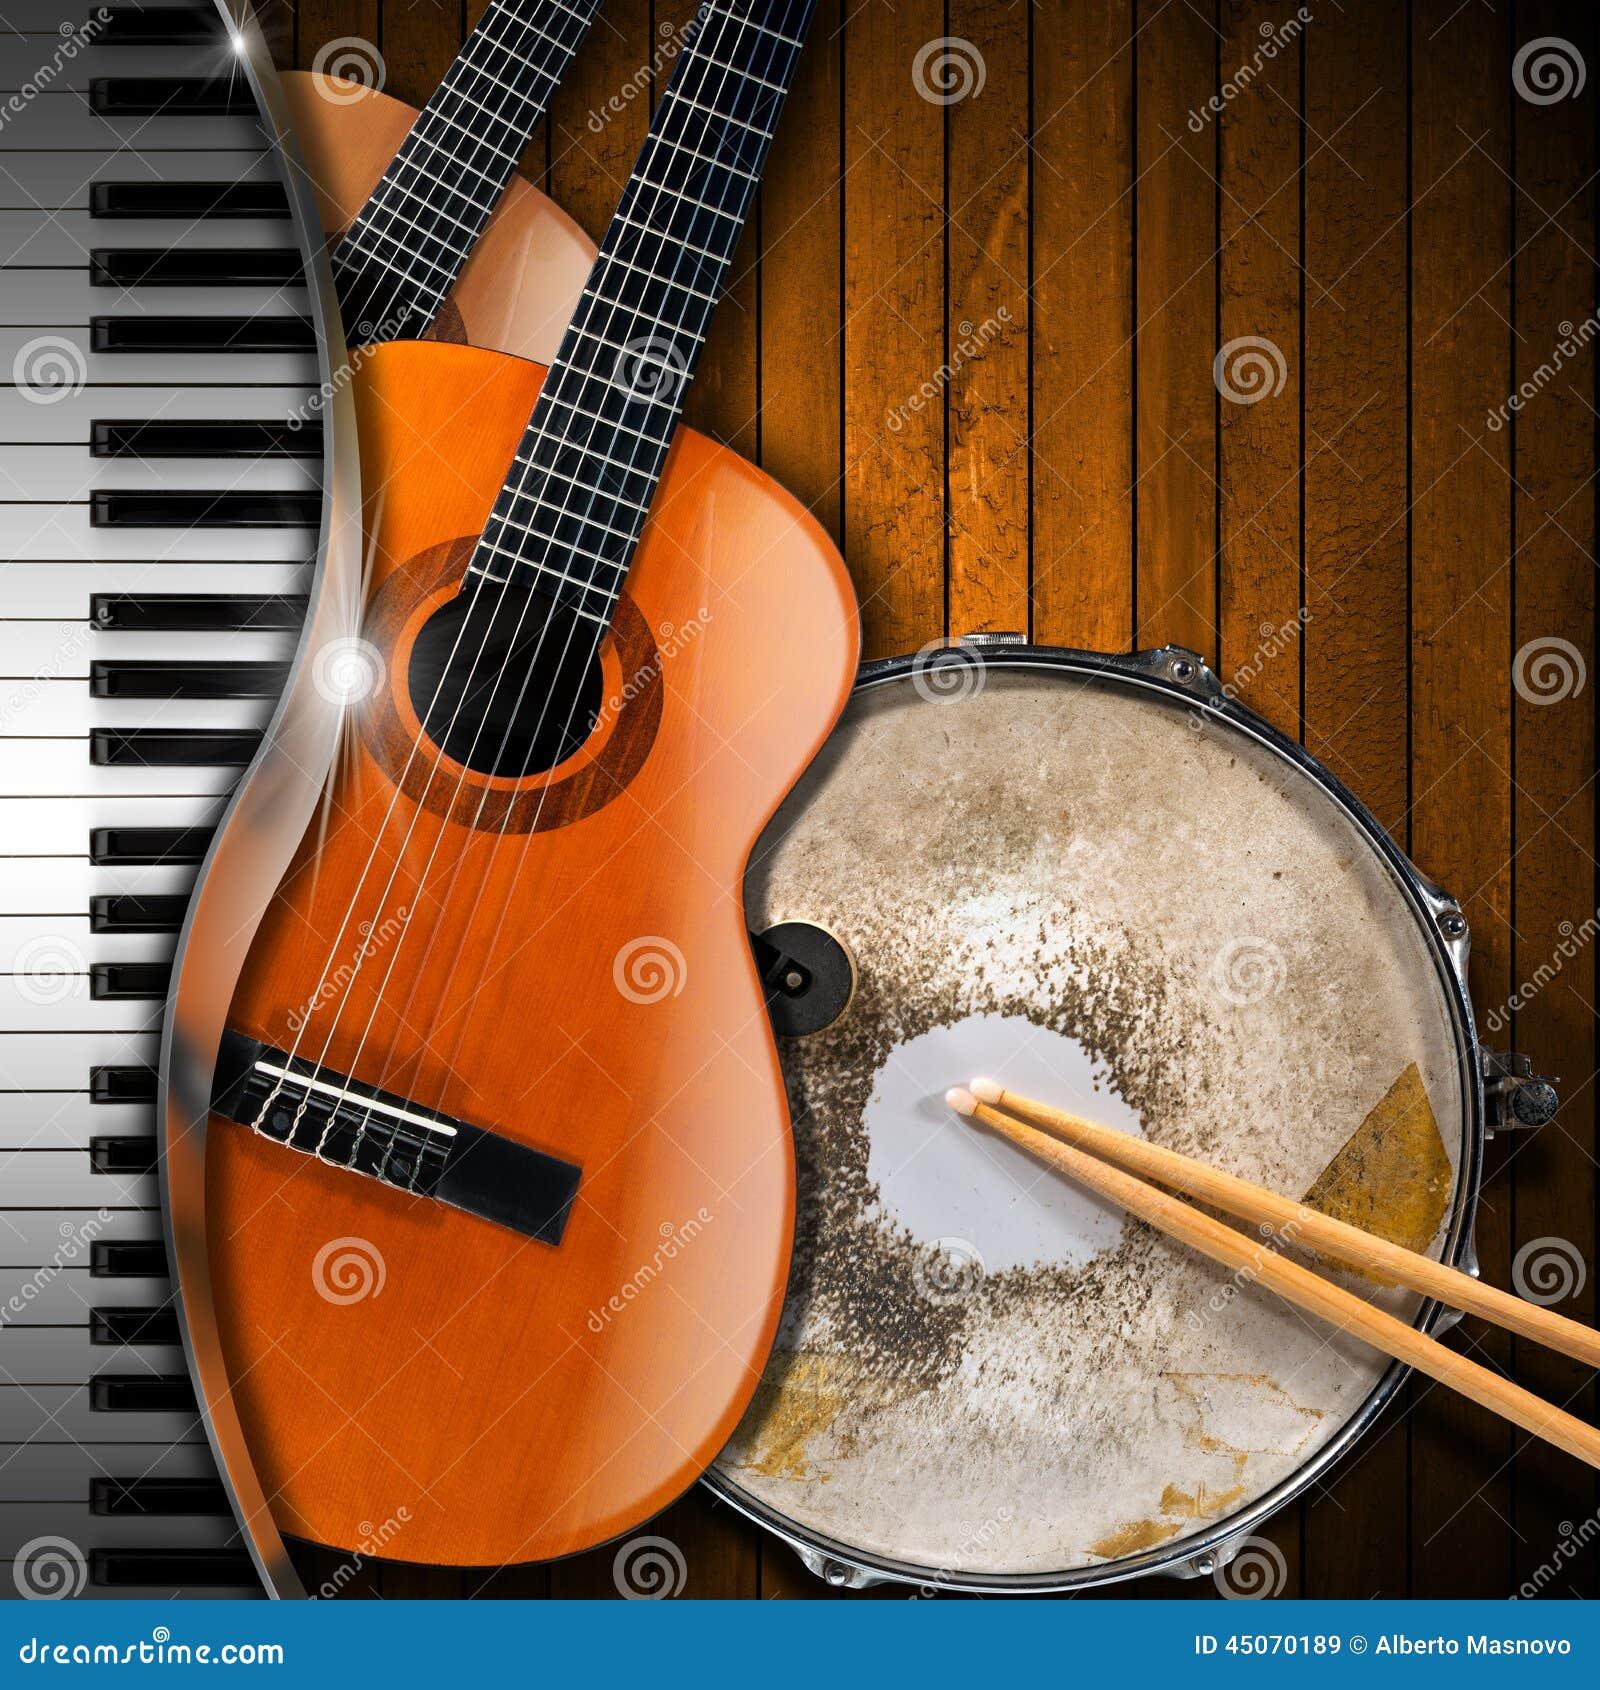 Acoustic guitar wall art